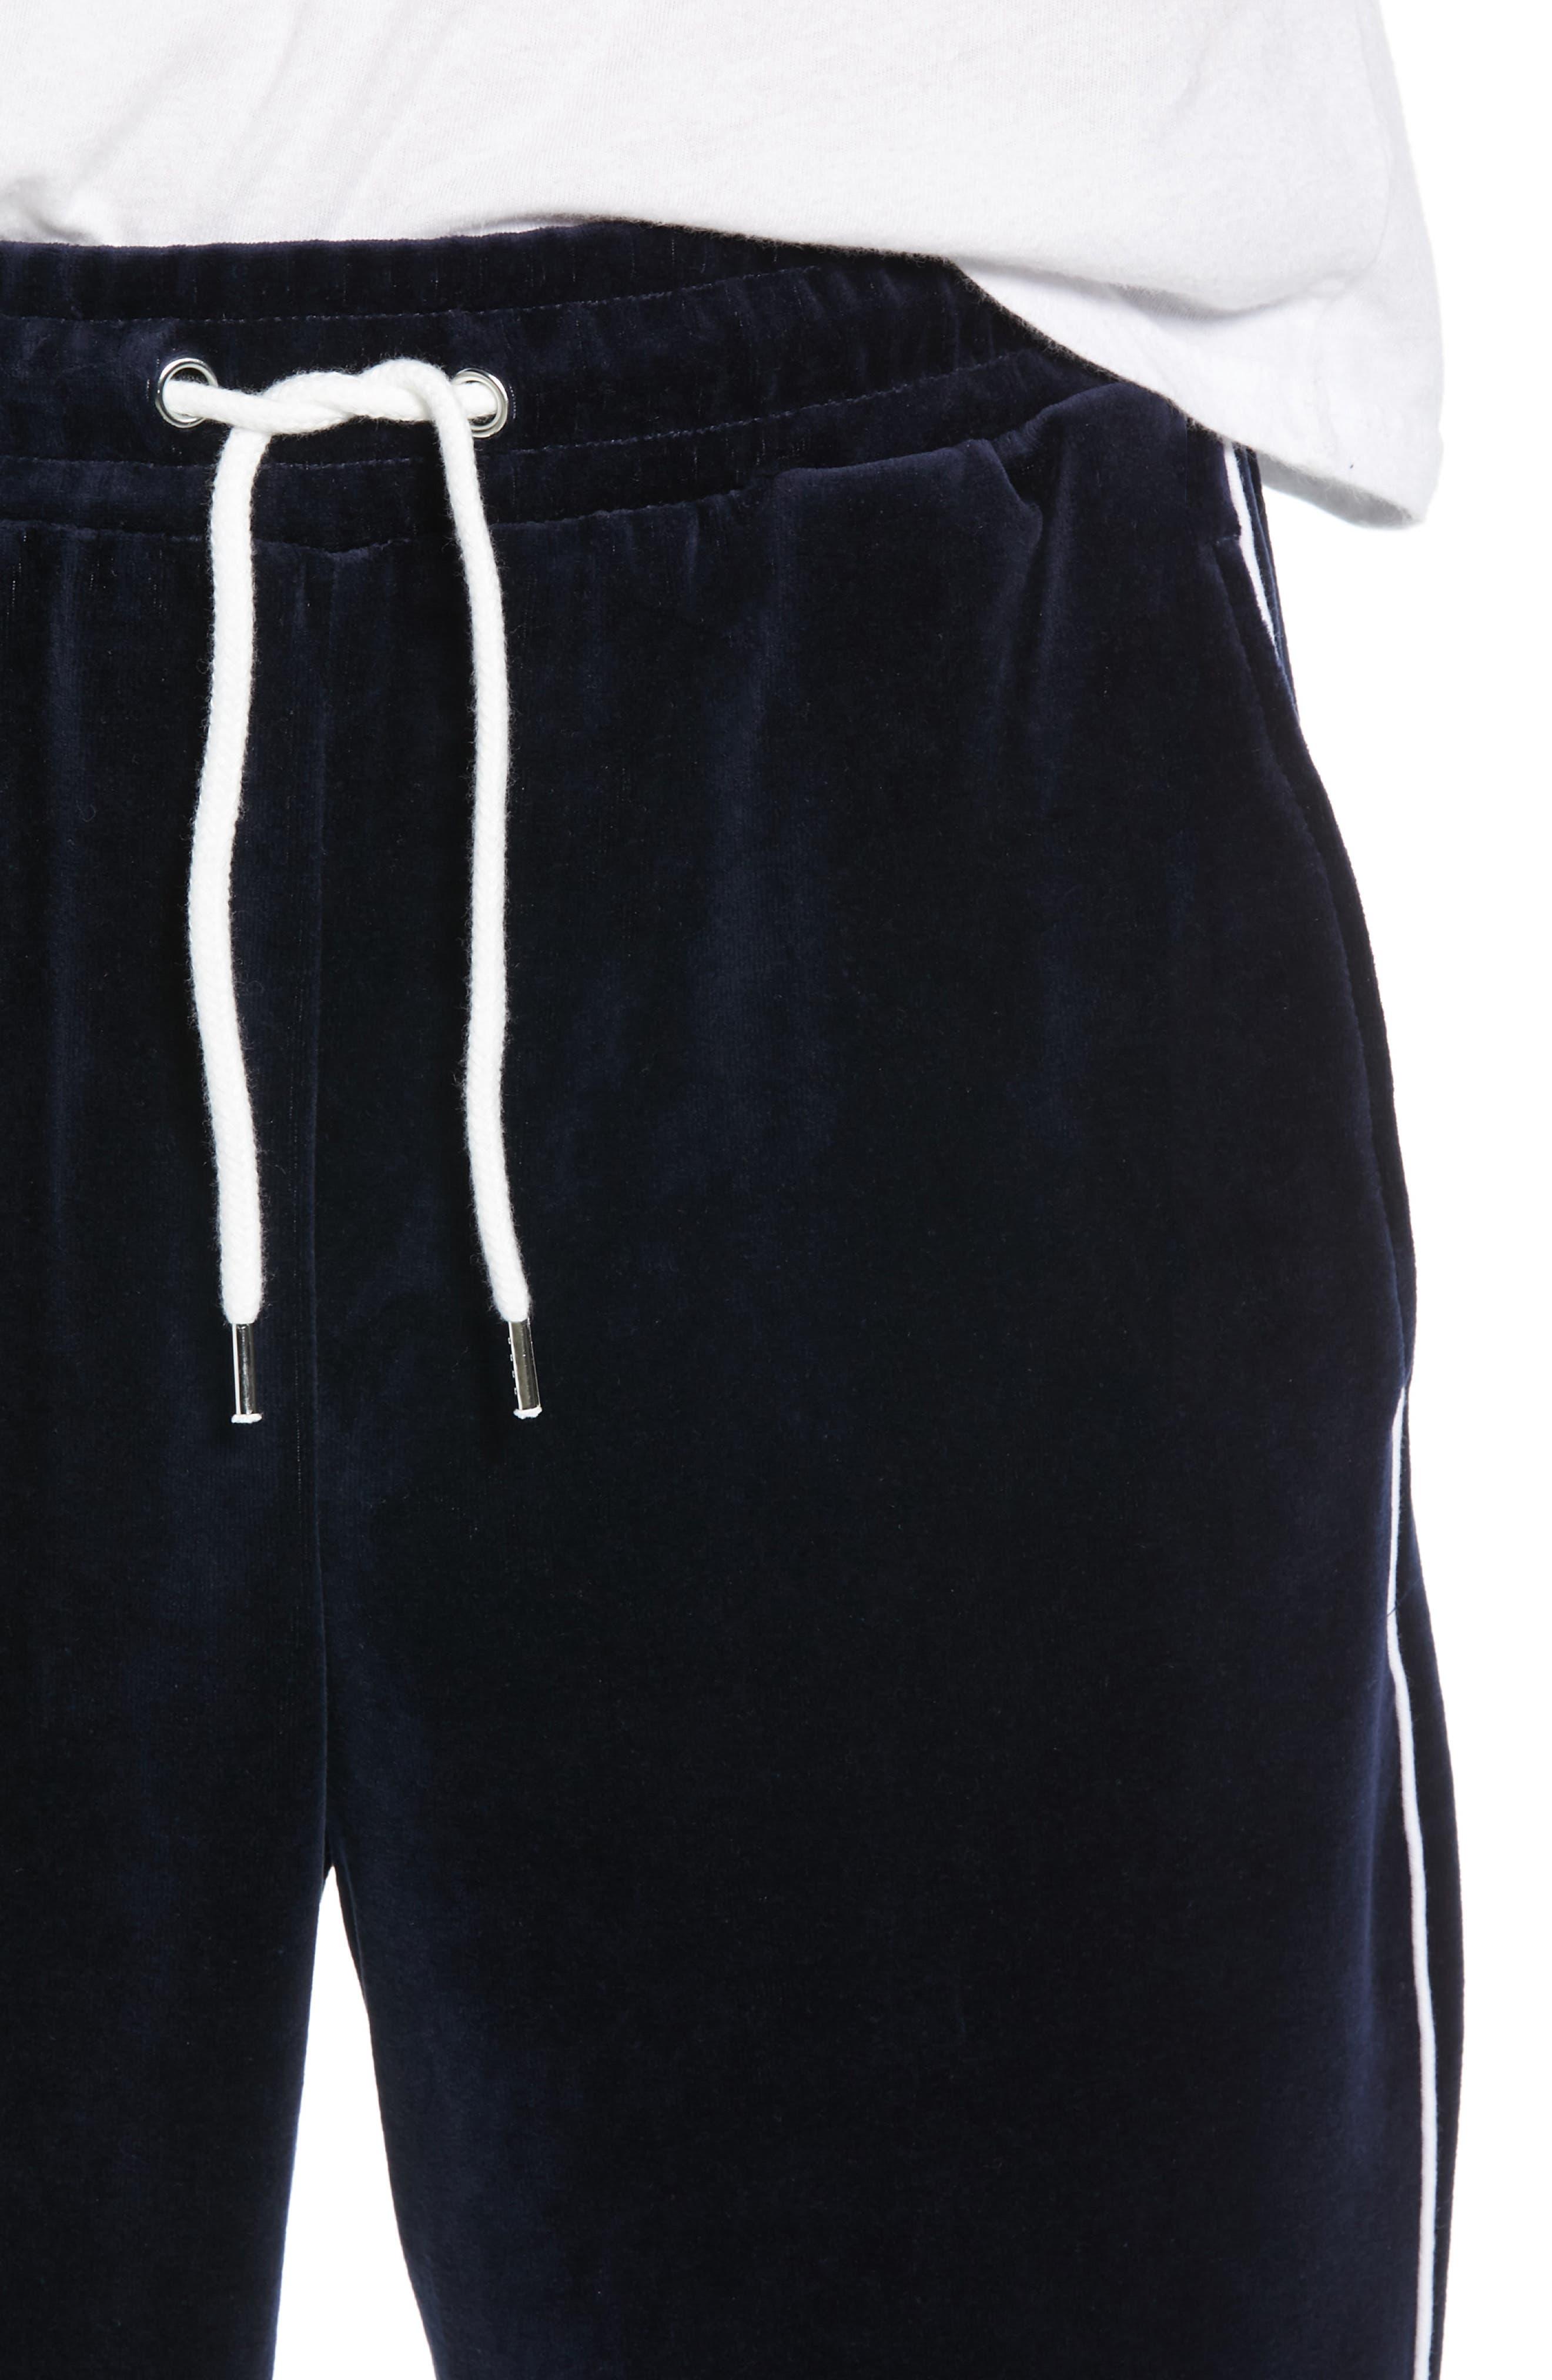 Velour Pants,                             Alternate thumbnail 4, color,                             NAVY BLUE